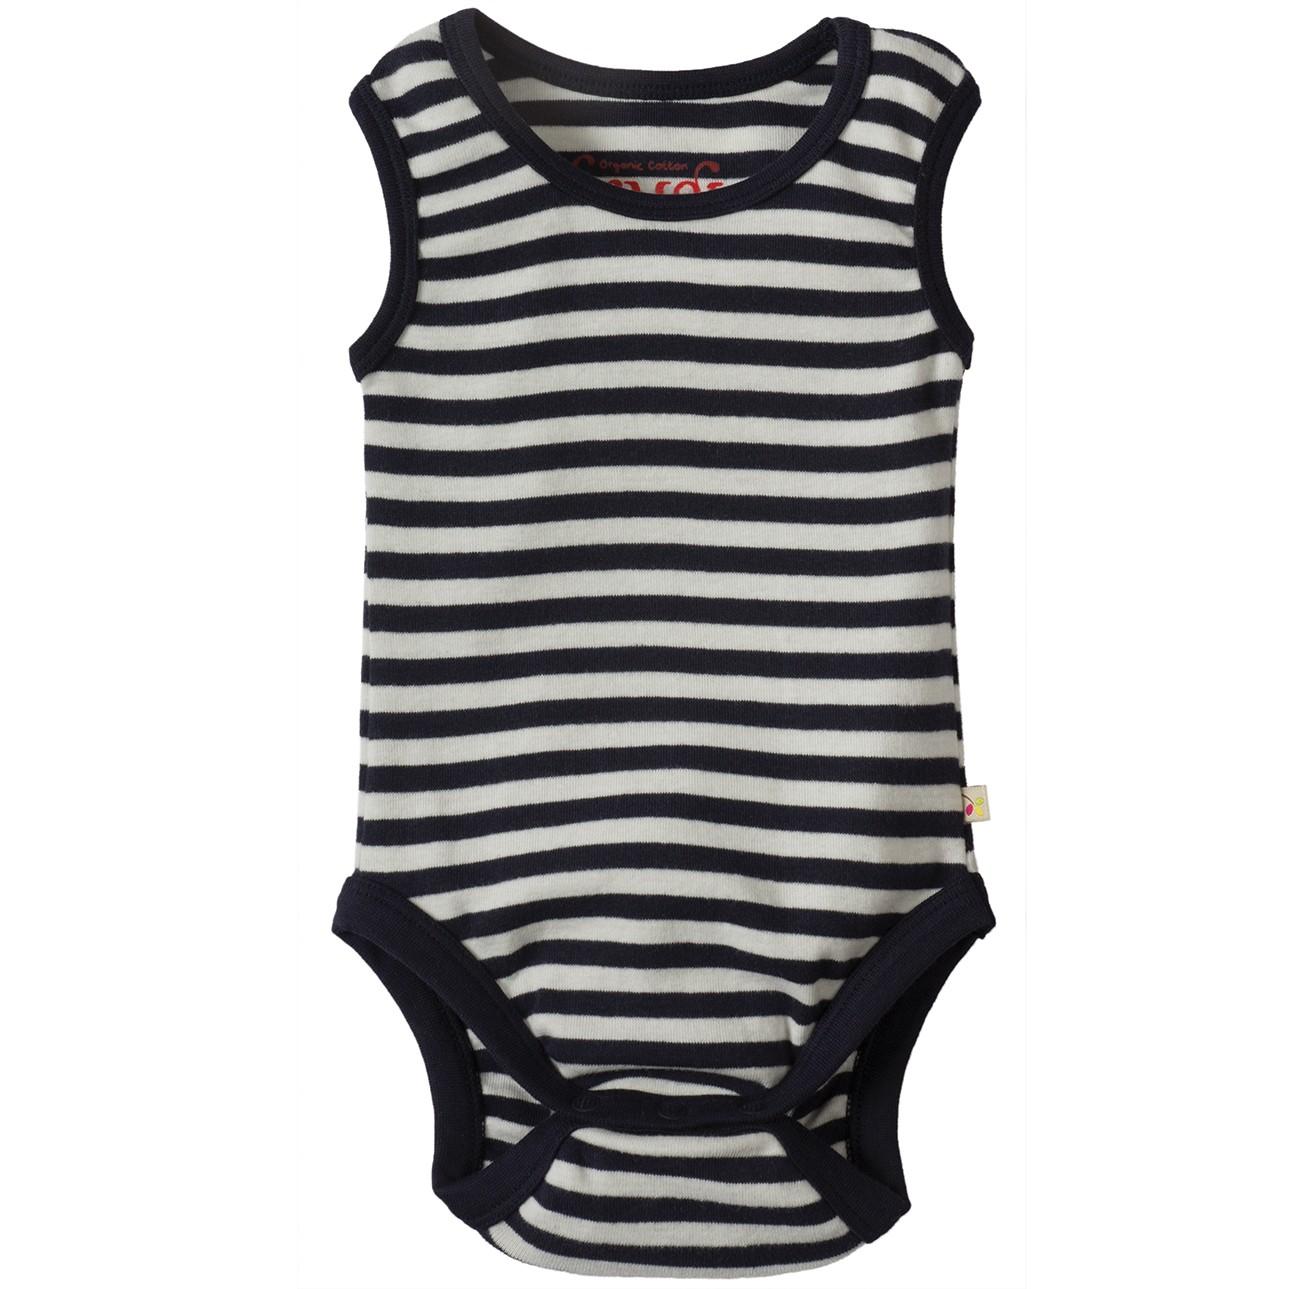 9ab6cdff7c720 bbs706ton__frugi_sailor_striped_body_vests_3_.jpg